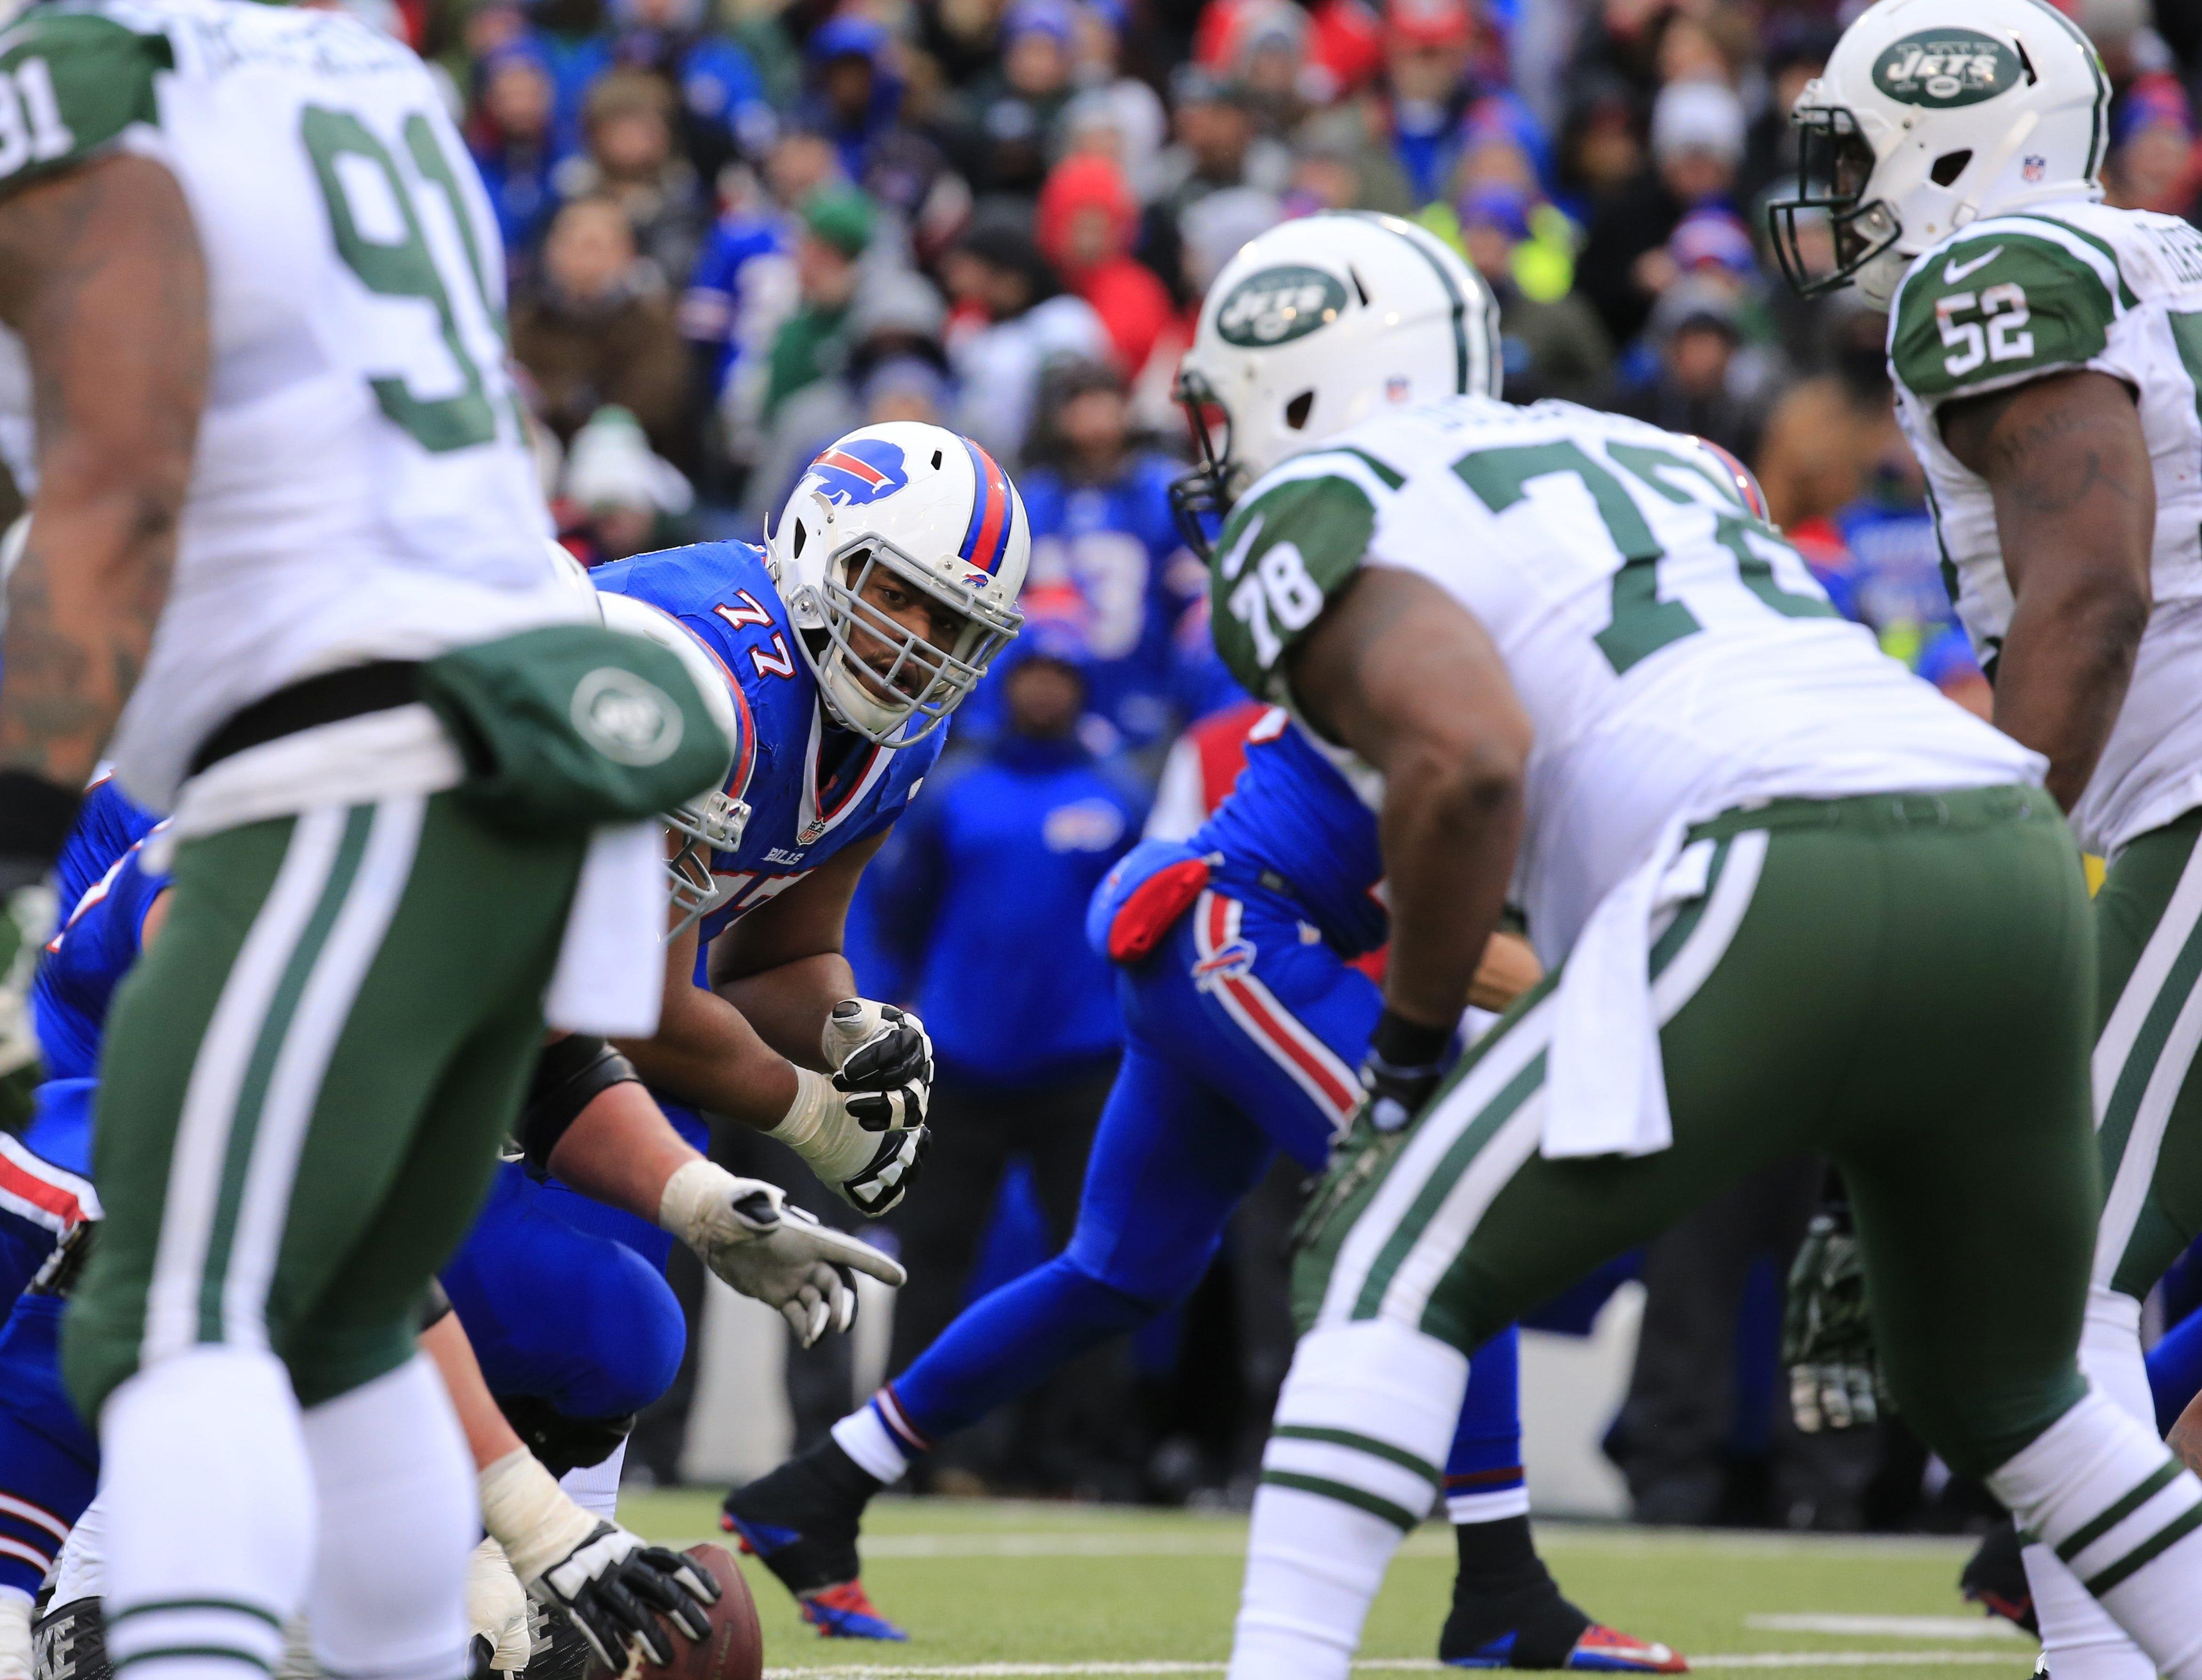 Buffalo Bills Cordy Glenn looks to  block against the New York Jets during third quarter action  at Ralph Wilson Stadium on Sunday, Jan. 3, 2016.  (Harry Scull Jr./Buffalo News)